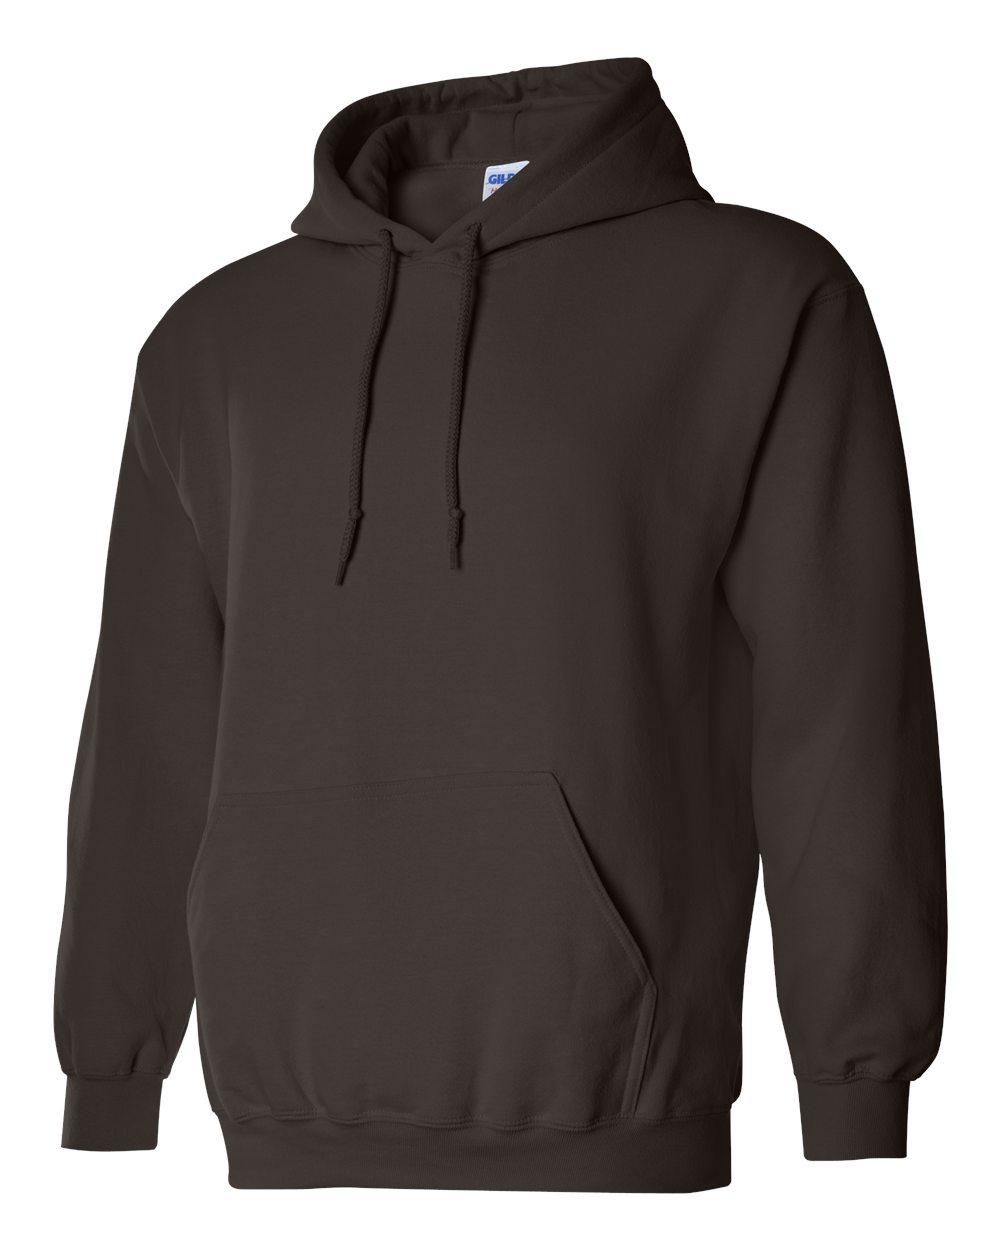 Gildan Heavy Blend Hooded Sweatshirt GI18500 Dark Chocolate